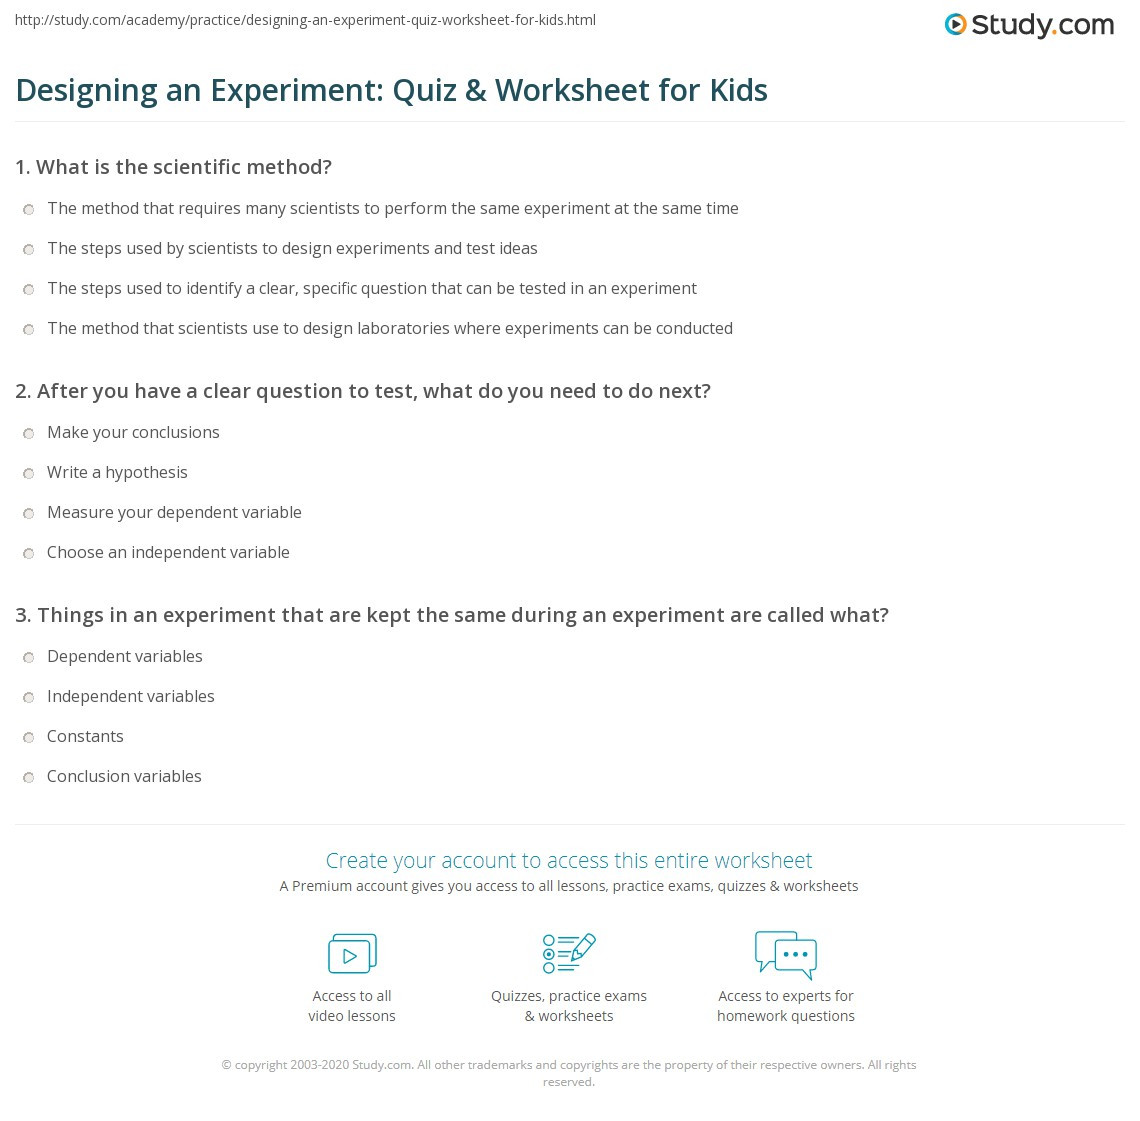 Designing an Experiment Quiz & Worksheet for Kids